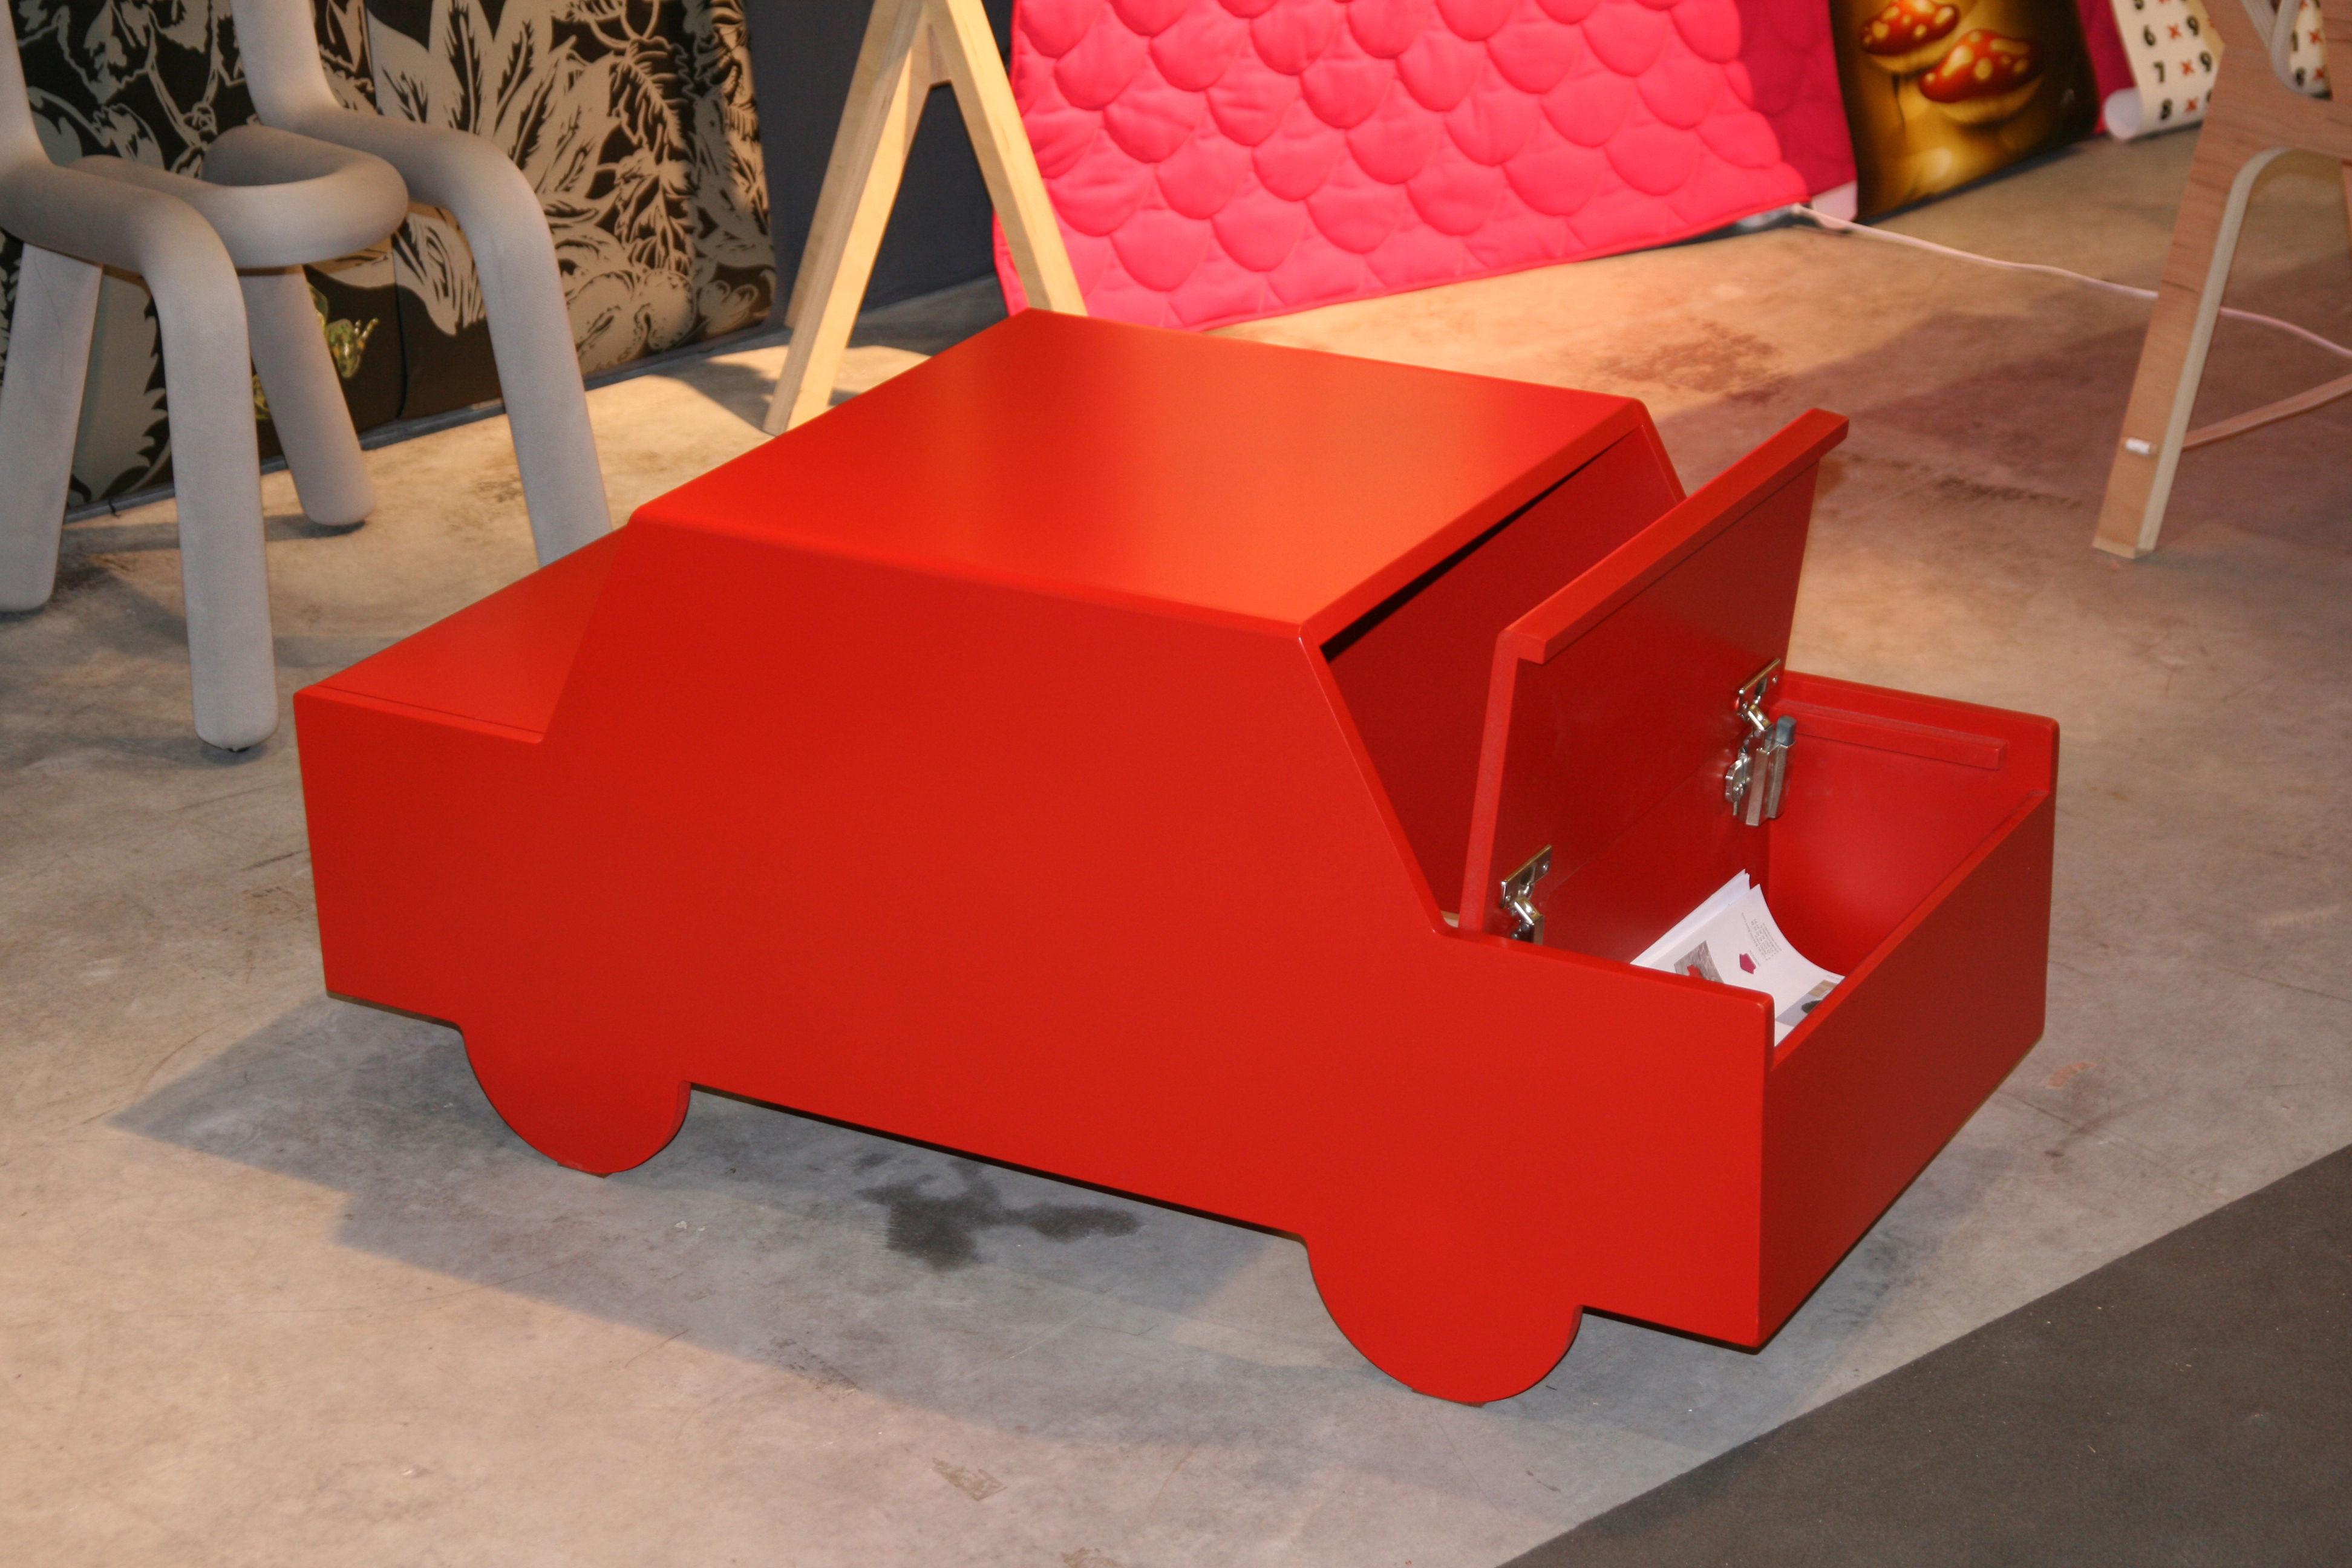 ornicar children 39 s desk car red by domestic. Black Bedroom Furniture Sets. Home Design Ideas